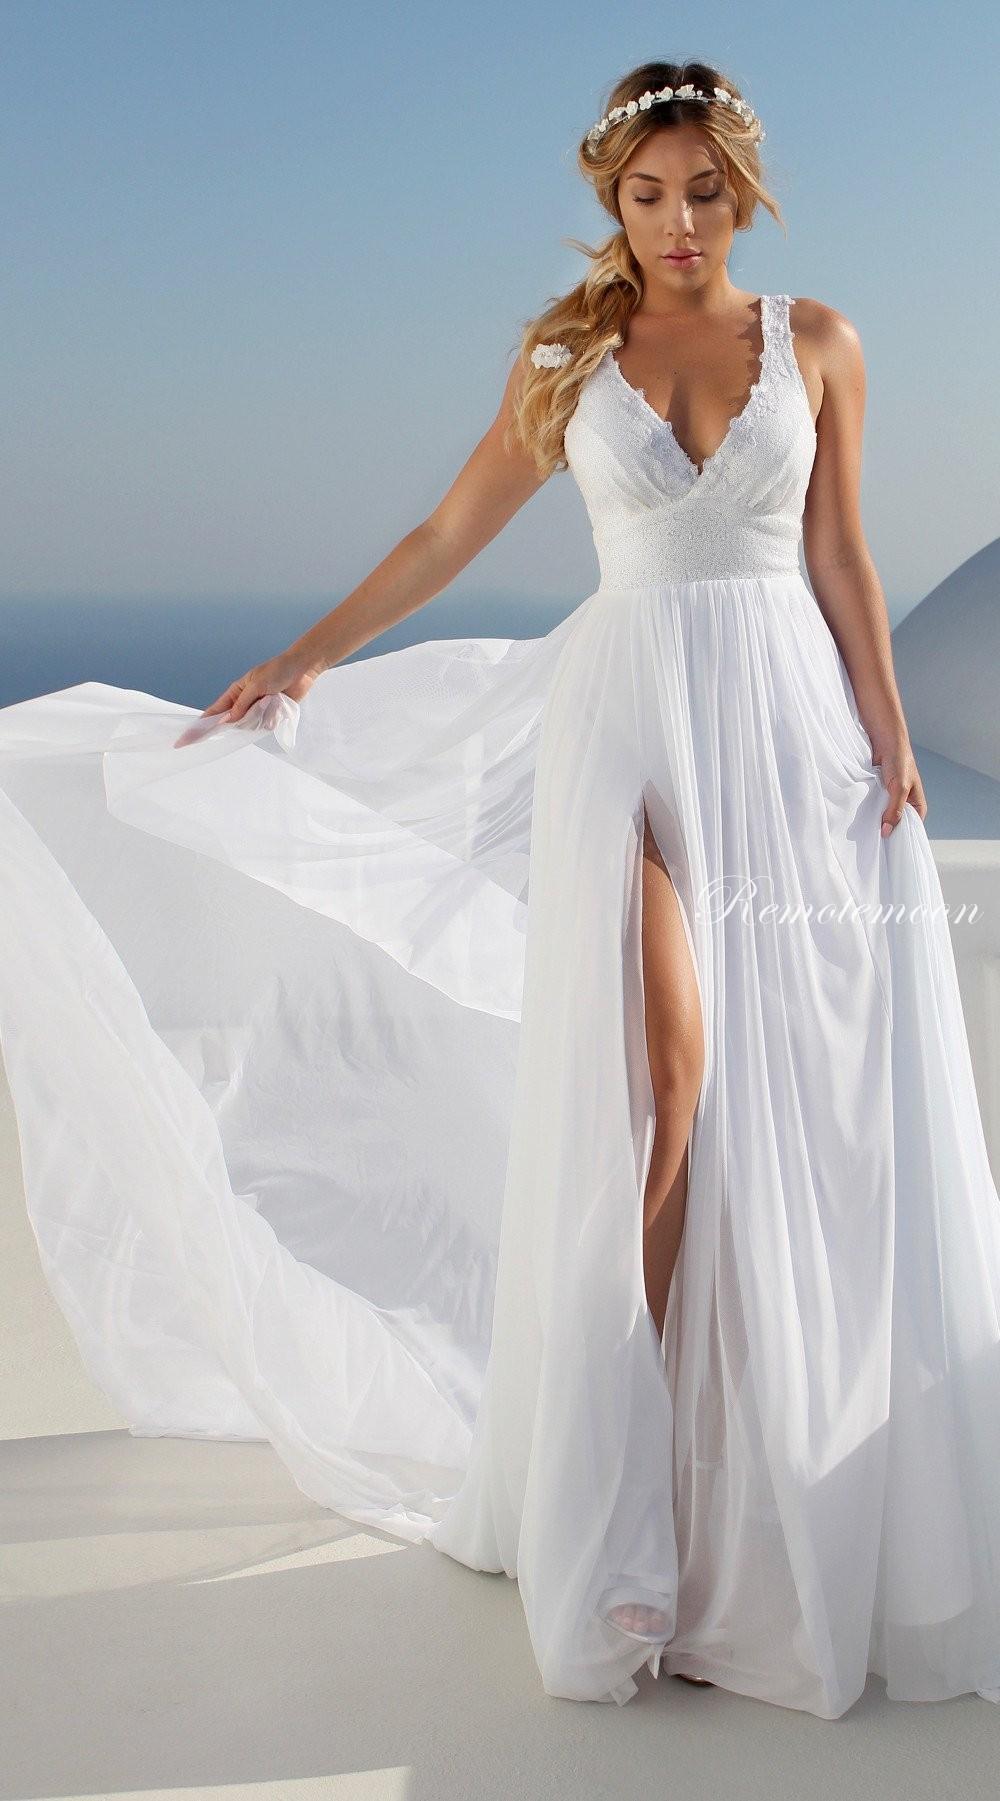 Deep V-Neck High Side Split Wedding Dress with Long Train White Lace ...